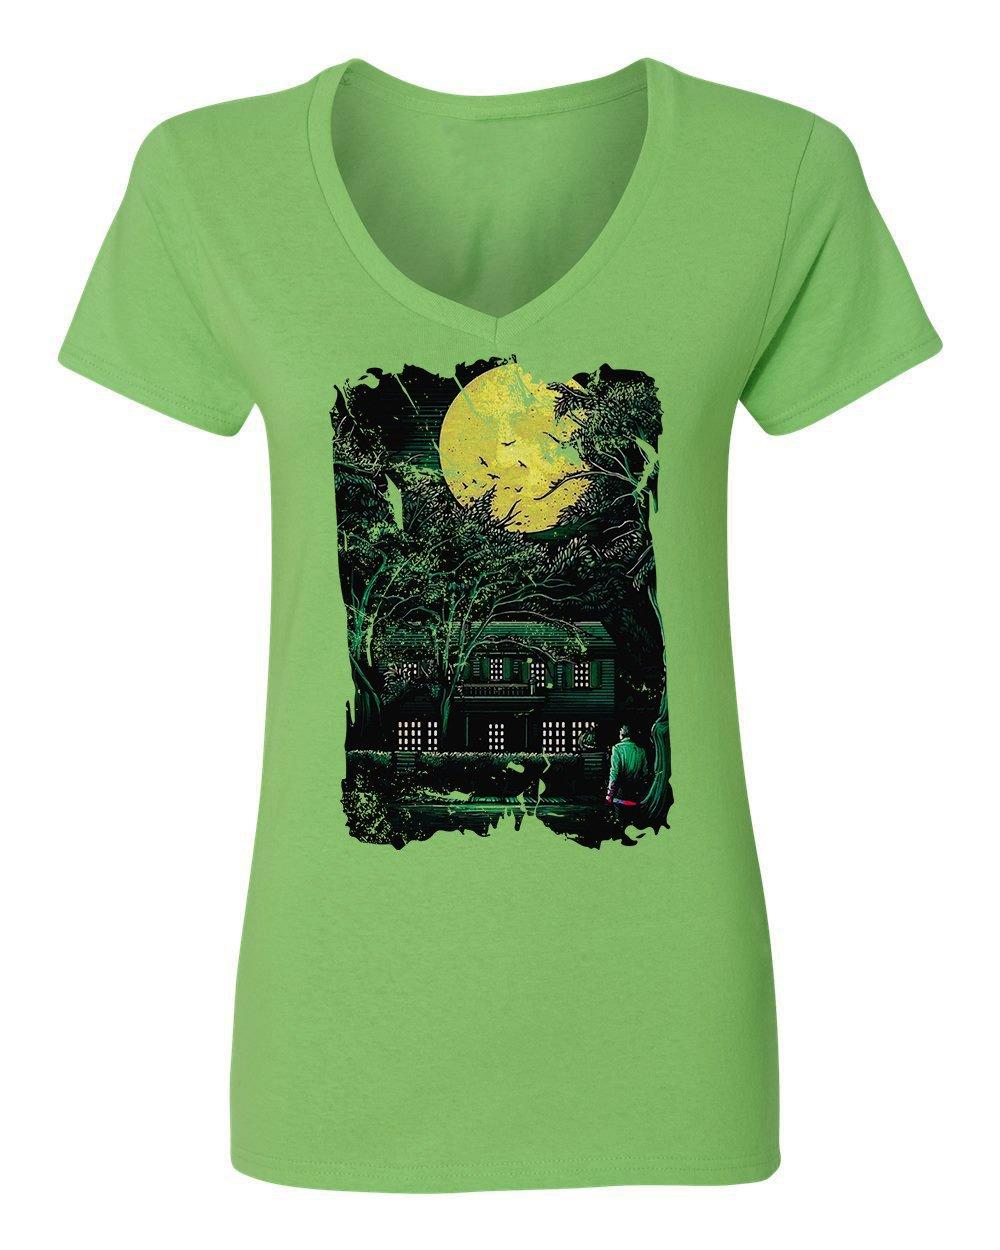 New Graphic Horror Movie Myers Novelty Tee Halloween Vneck T Shirt 8776